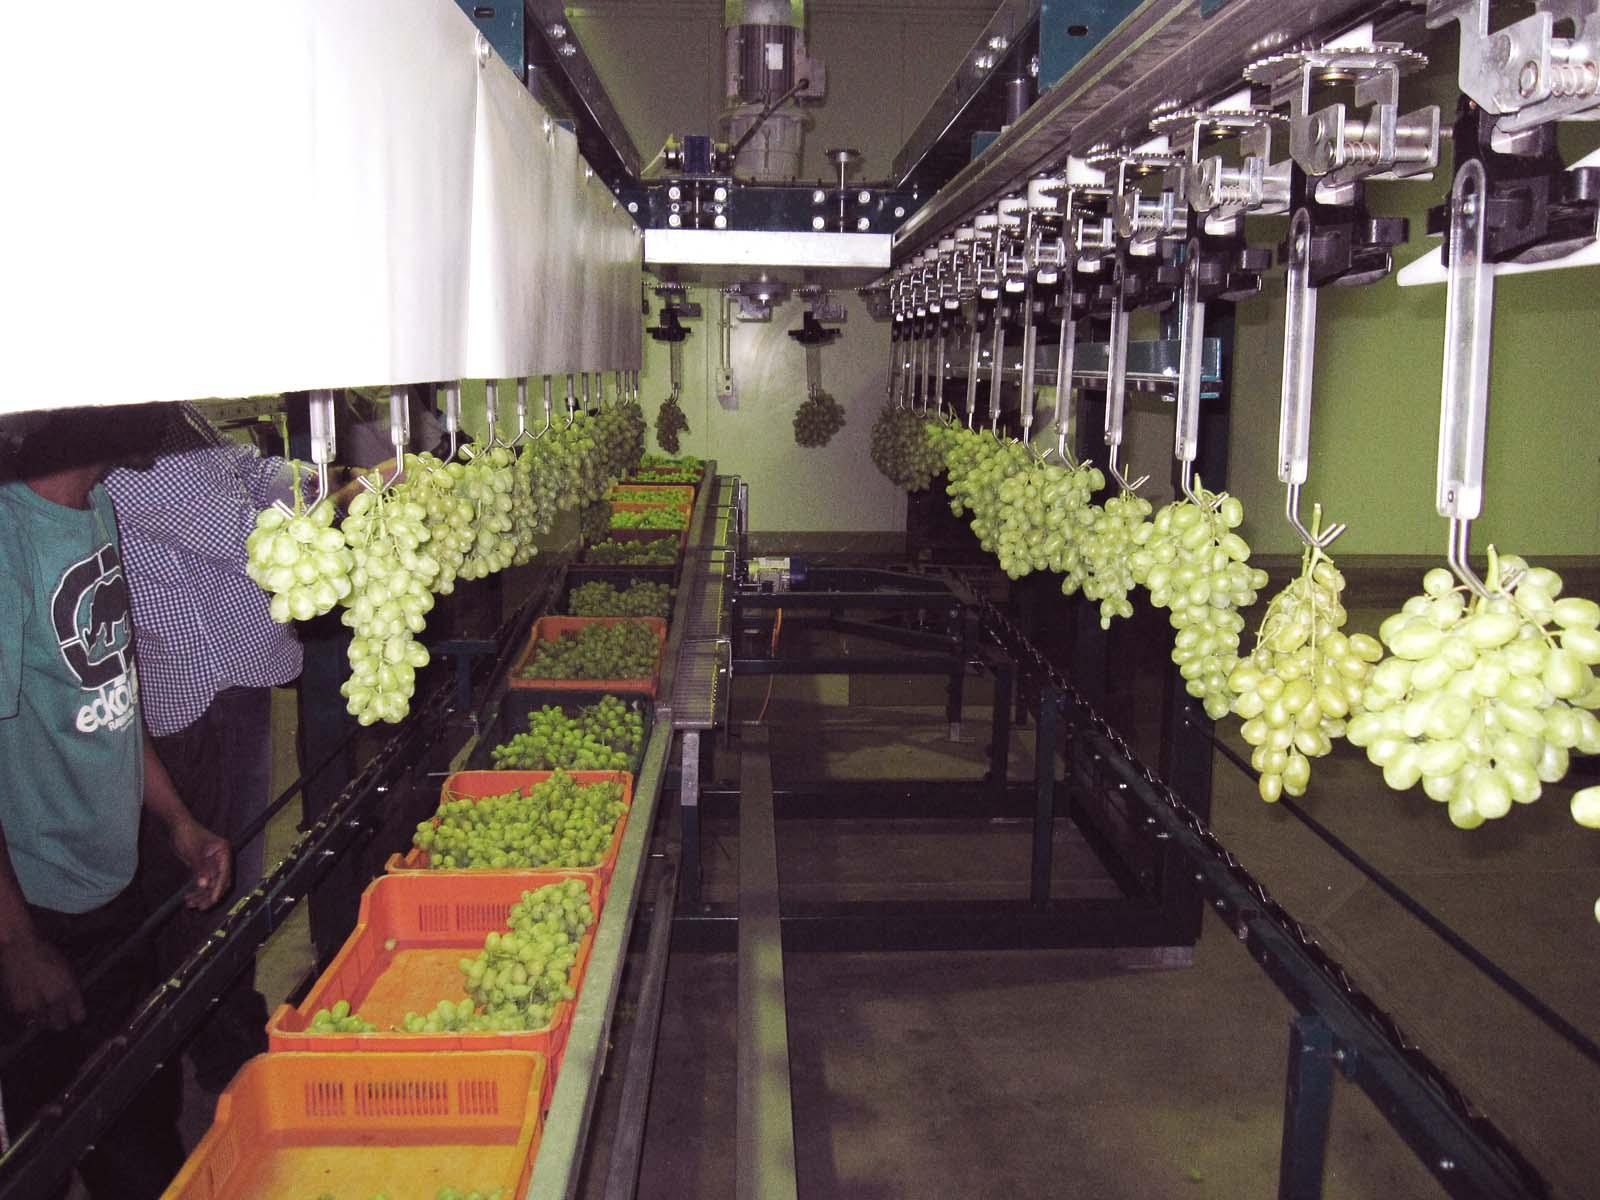 Grapes' sorting and packaging - GRAPESIZER